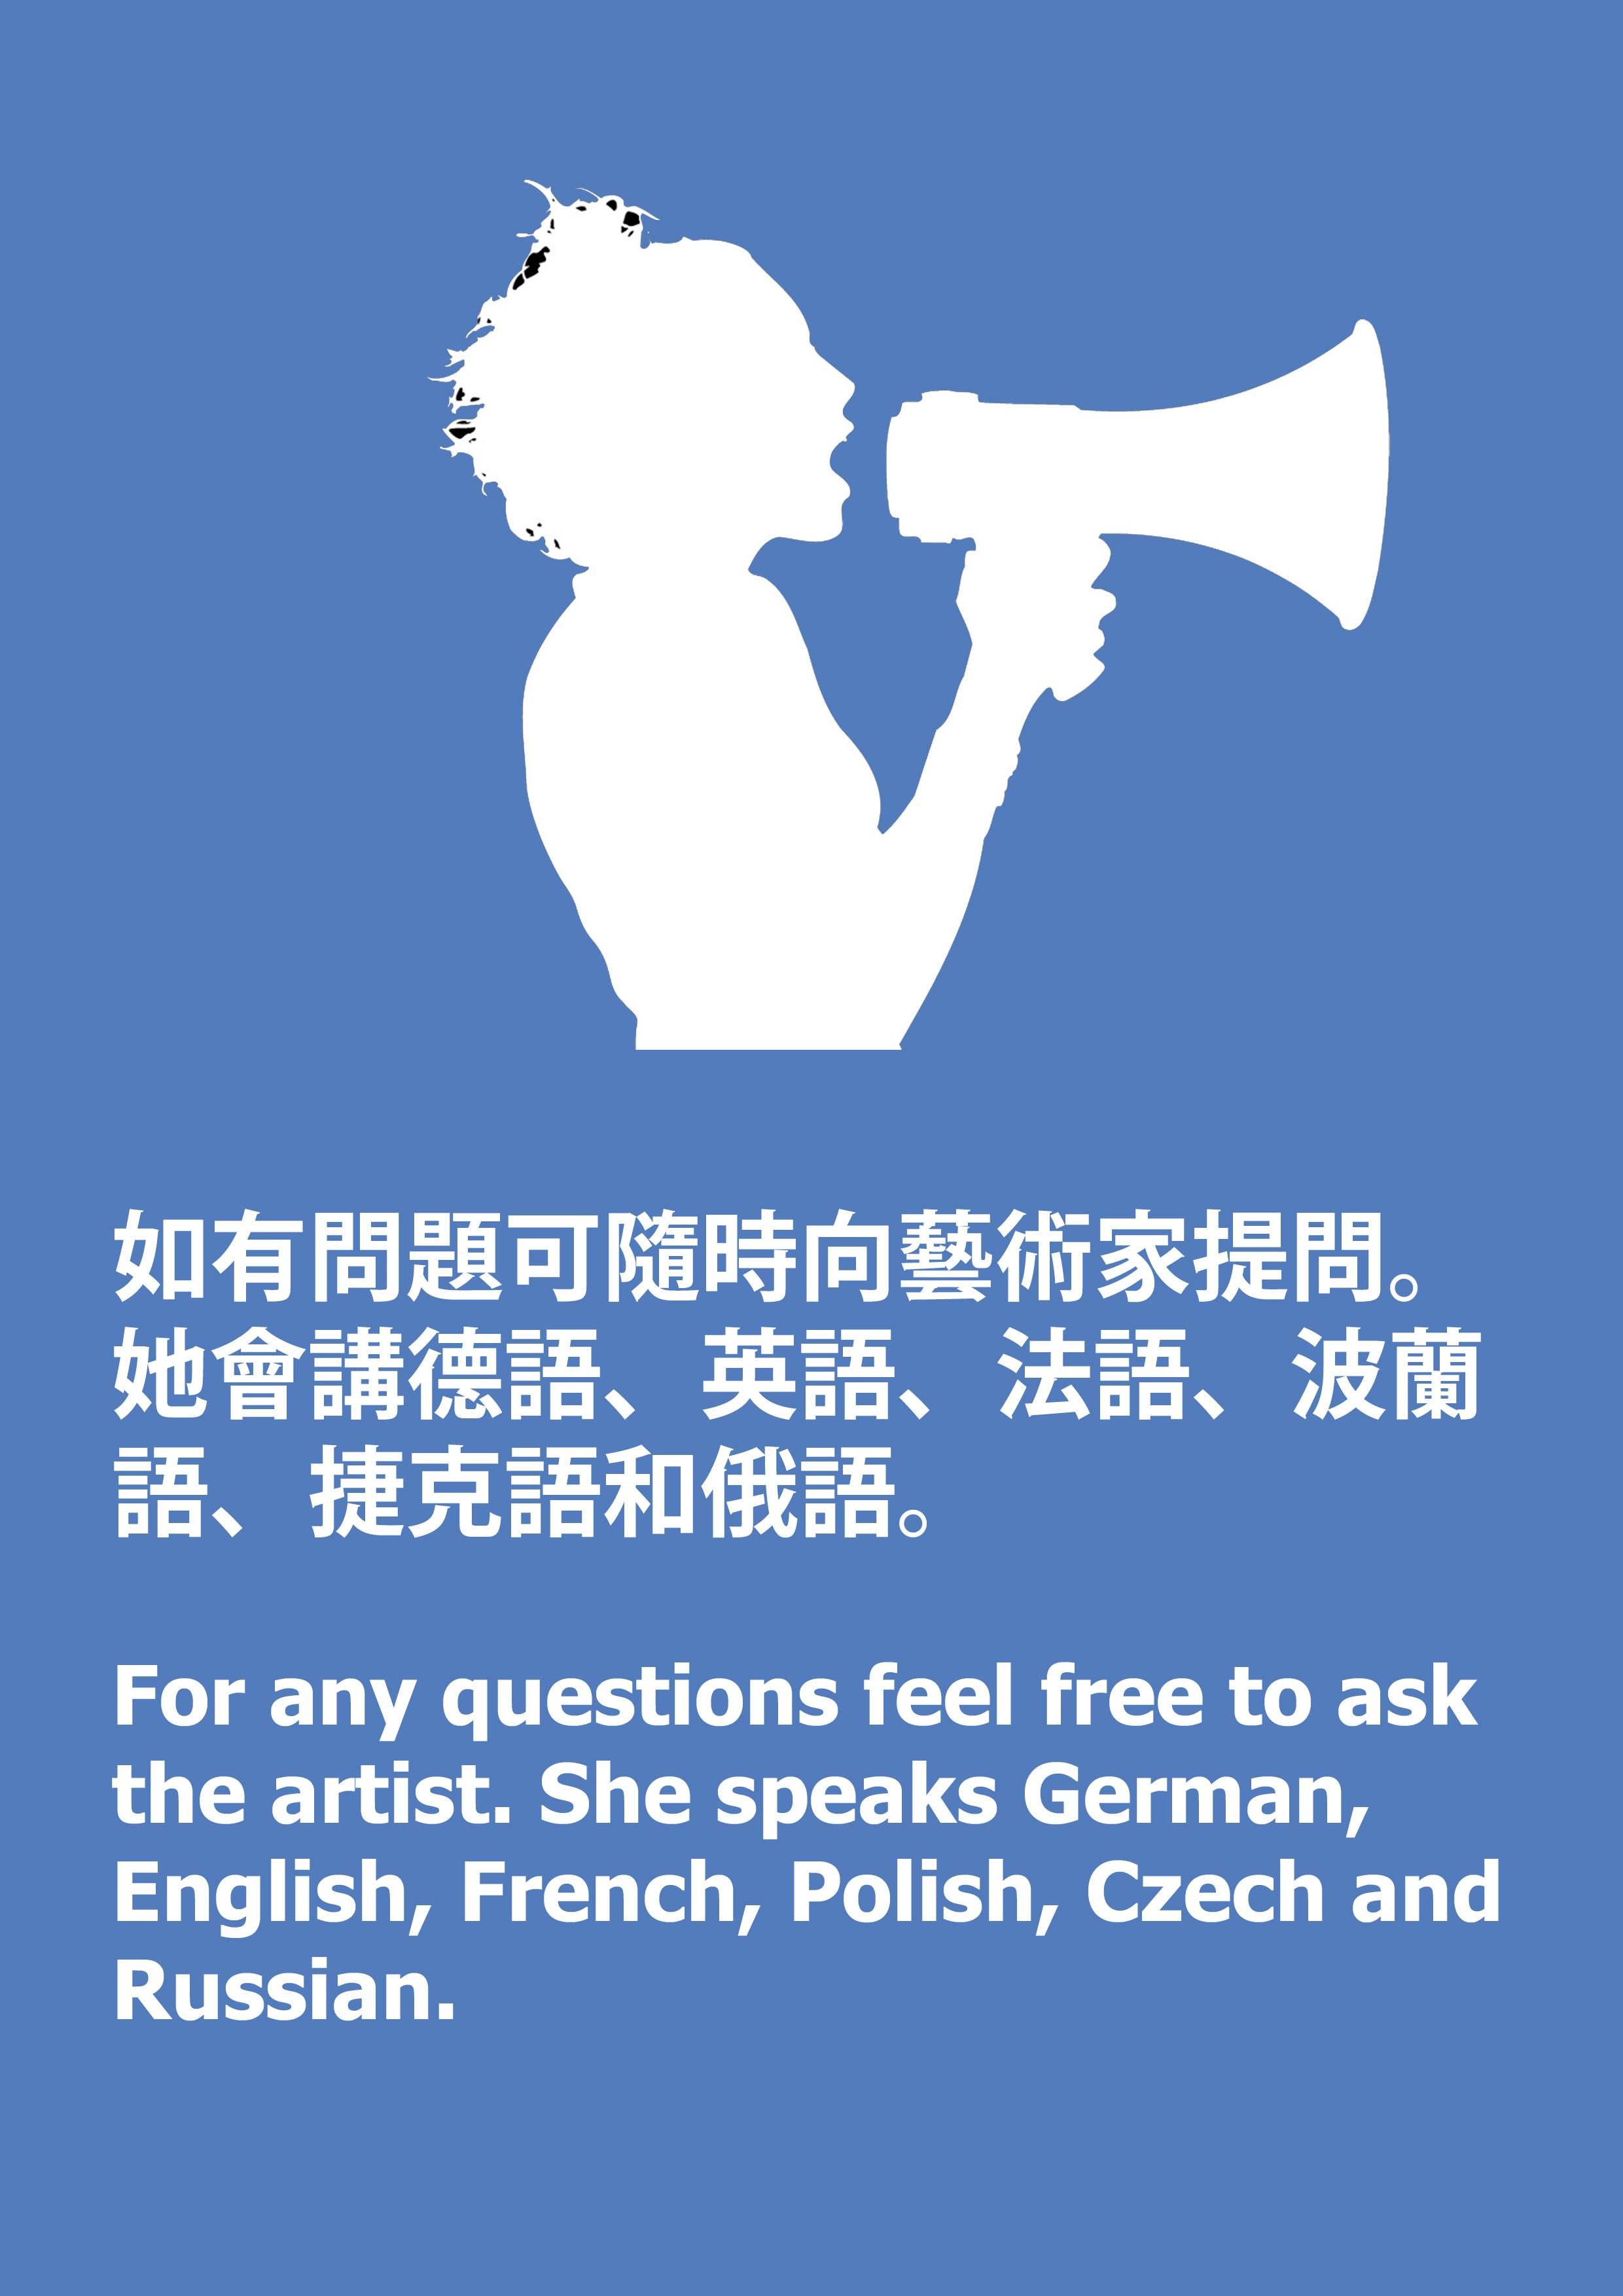 speaking_artist